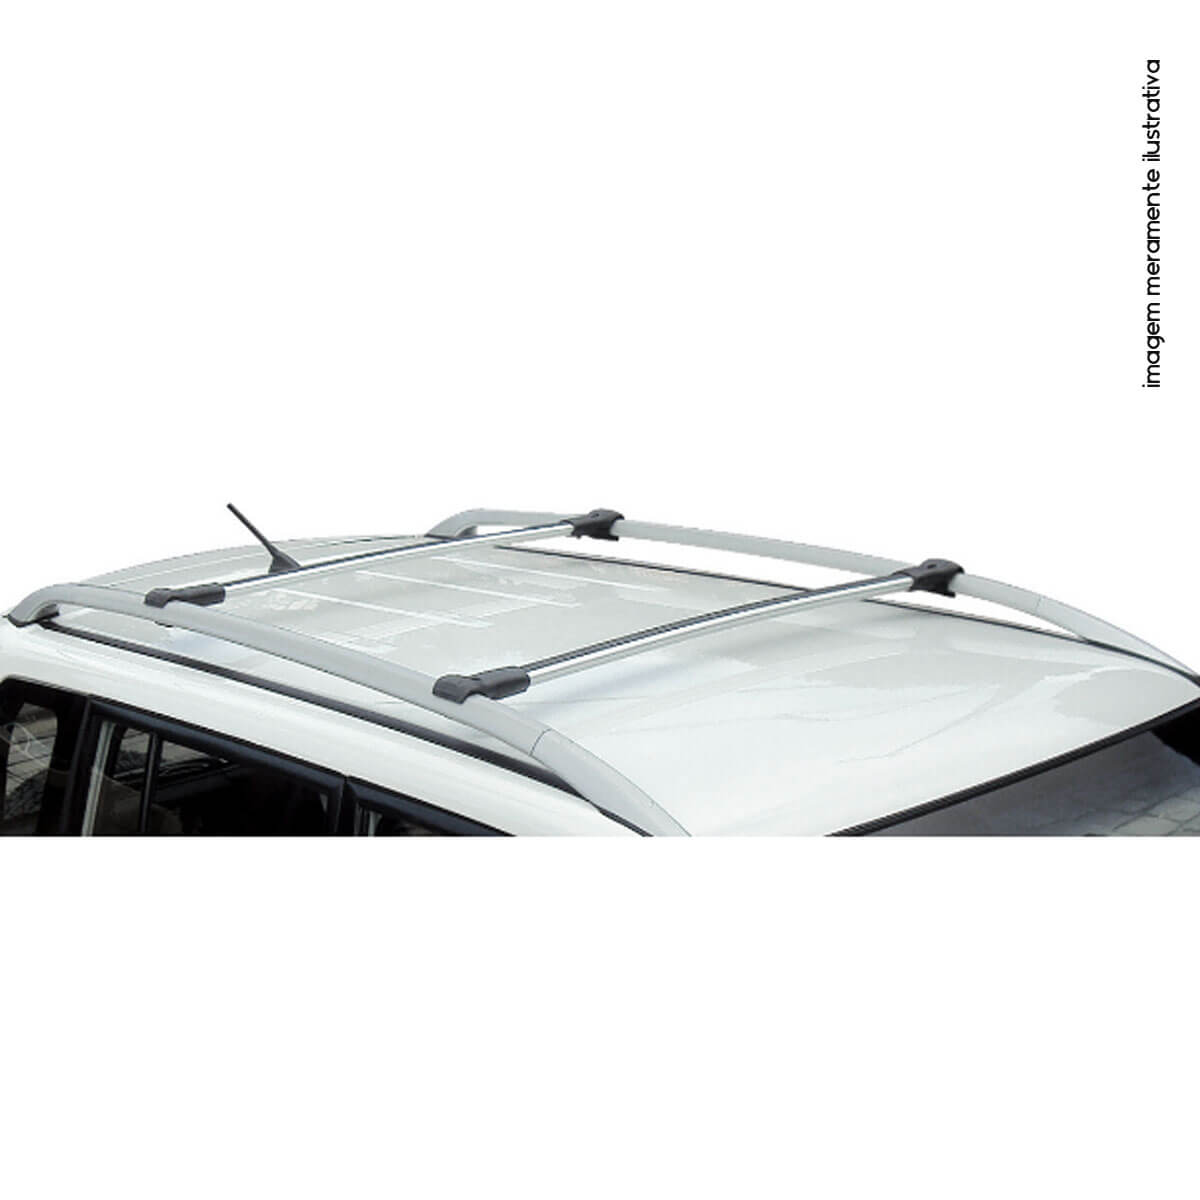 Travessa rack de teto larga alumínio IX35 2011 a 2021